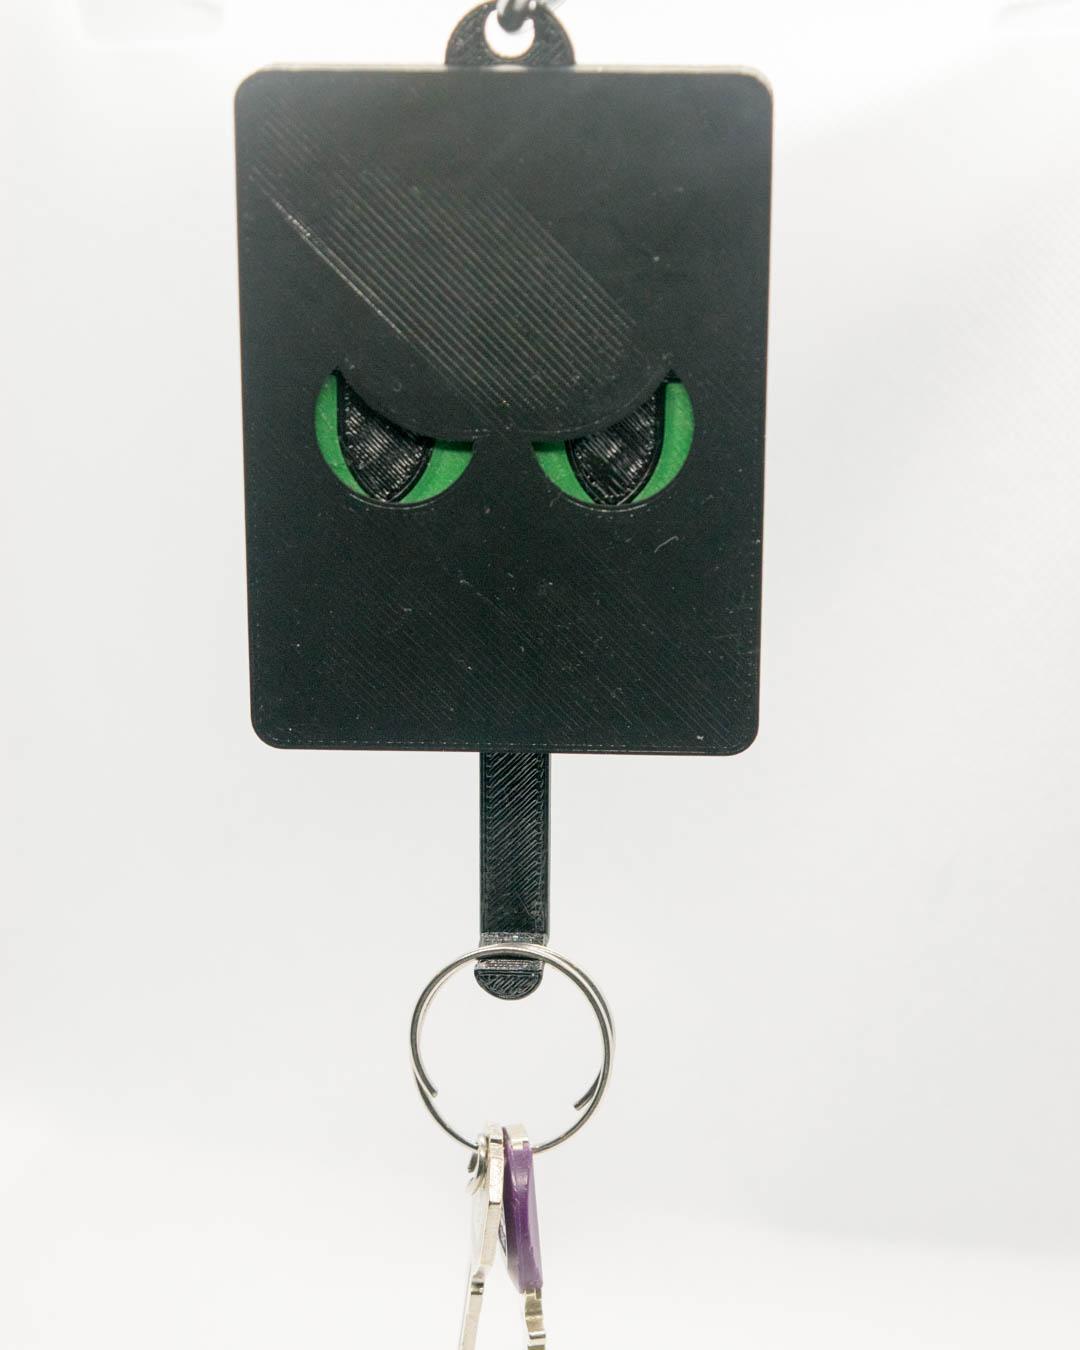 Schlüsselbrett, Keyguard, Moosgrüne Augen, Böse